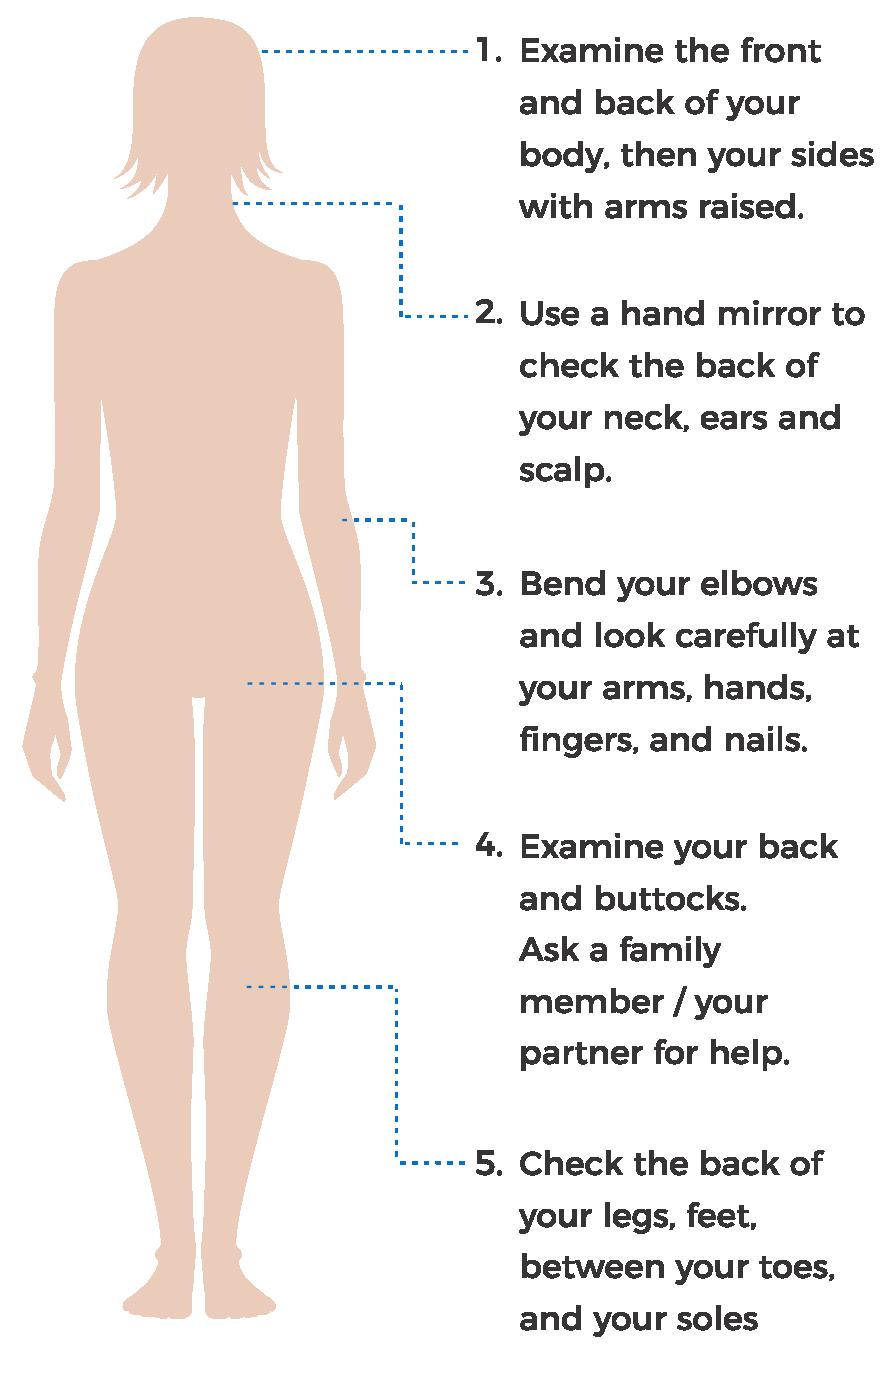 Self skin examination